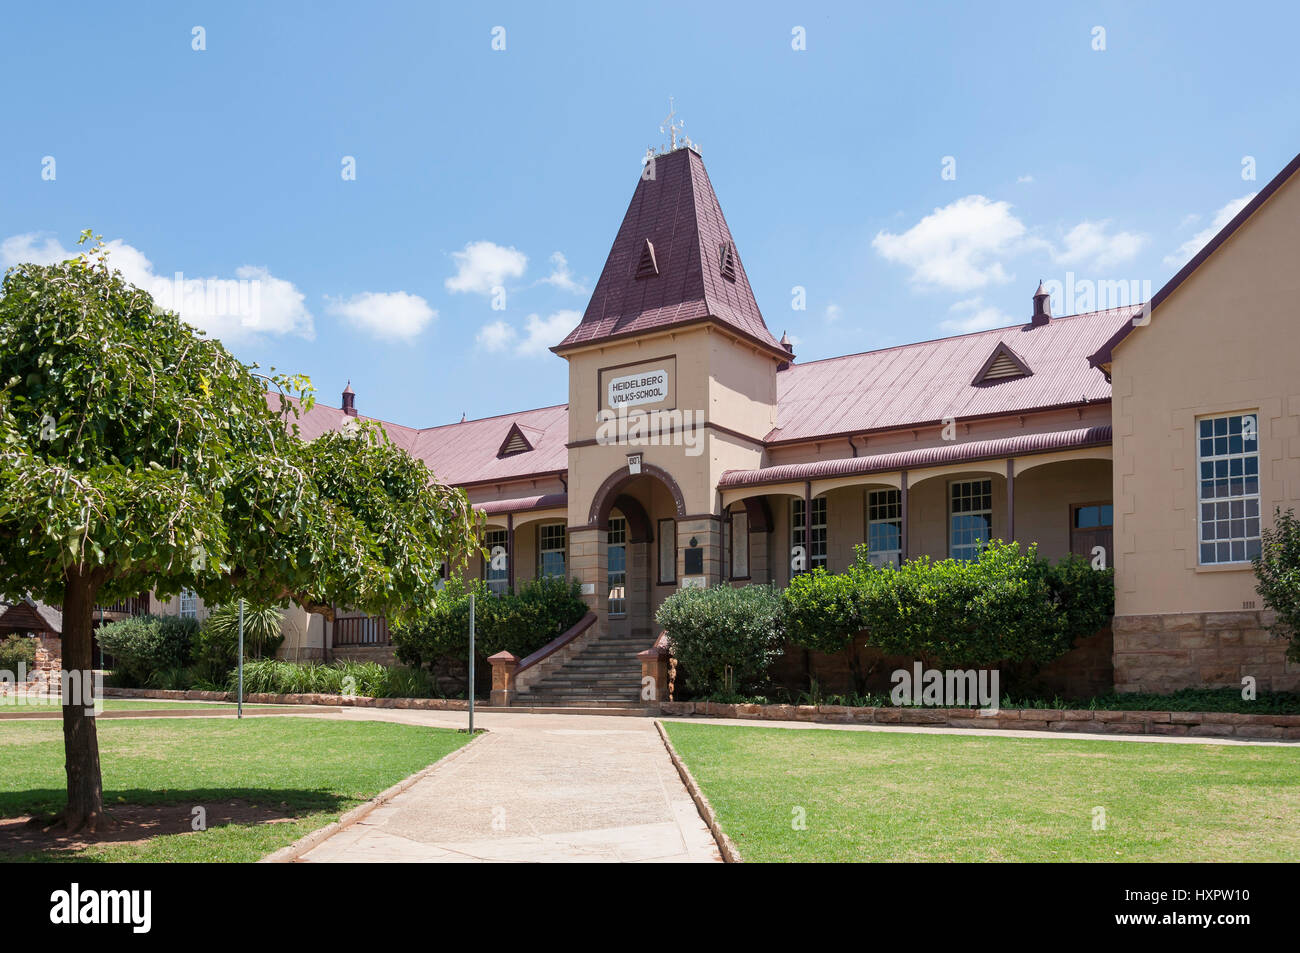 Afrikaans Primary School (Volks-School) building, Begeman Street, Heidelberg, Gauteng Province, Republic of South - Stock Image